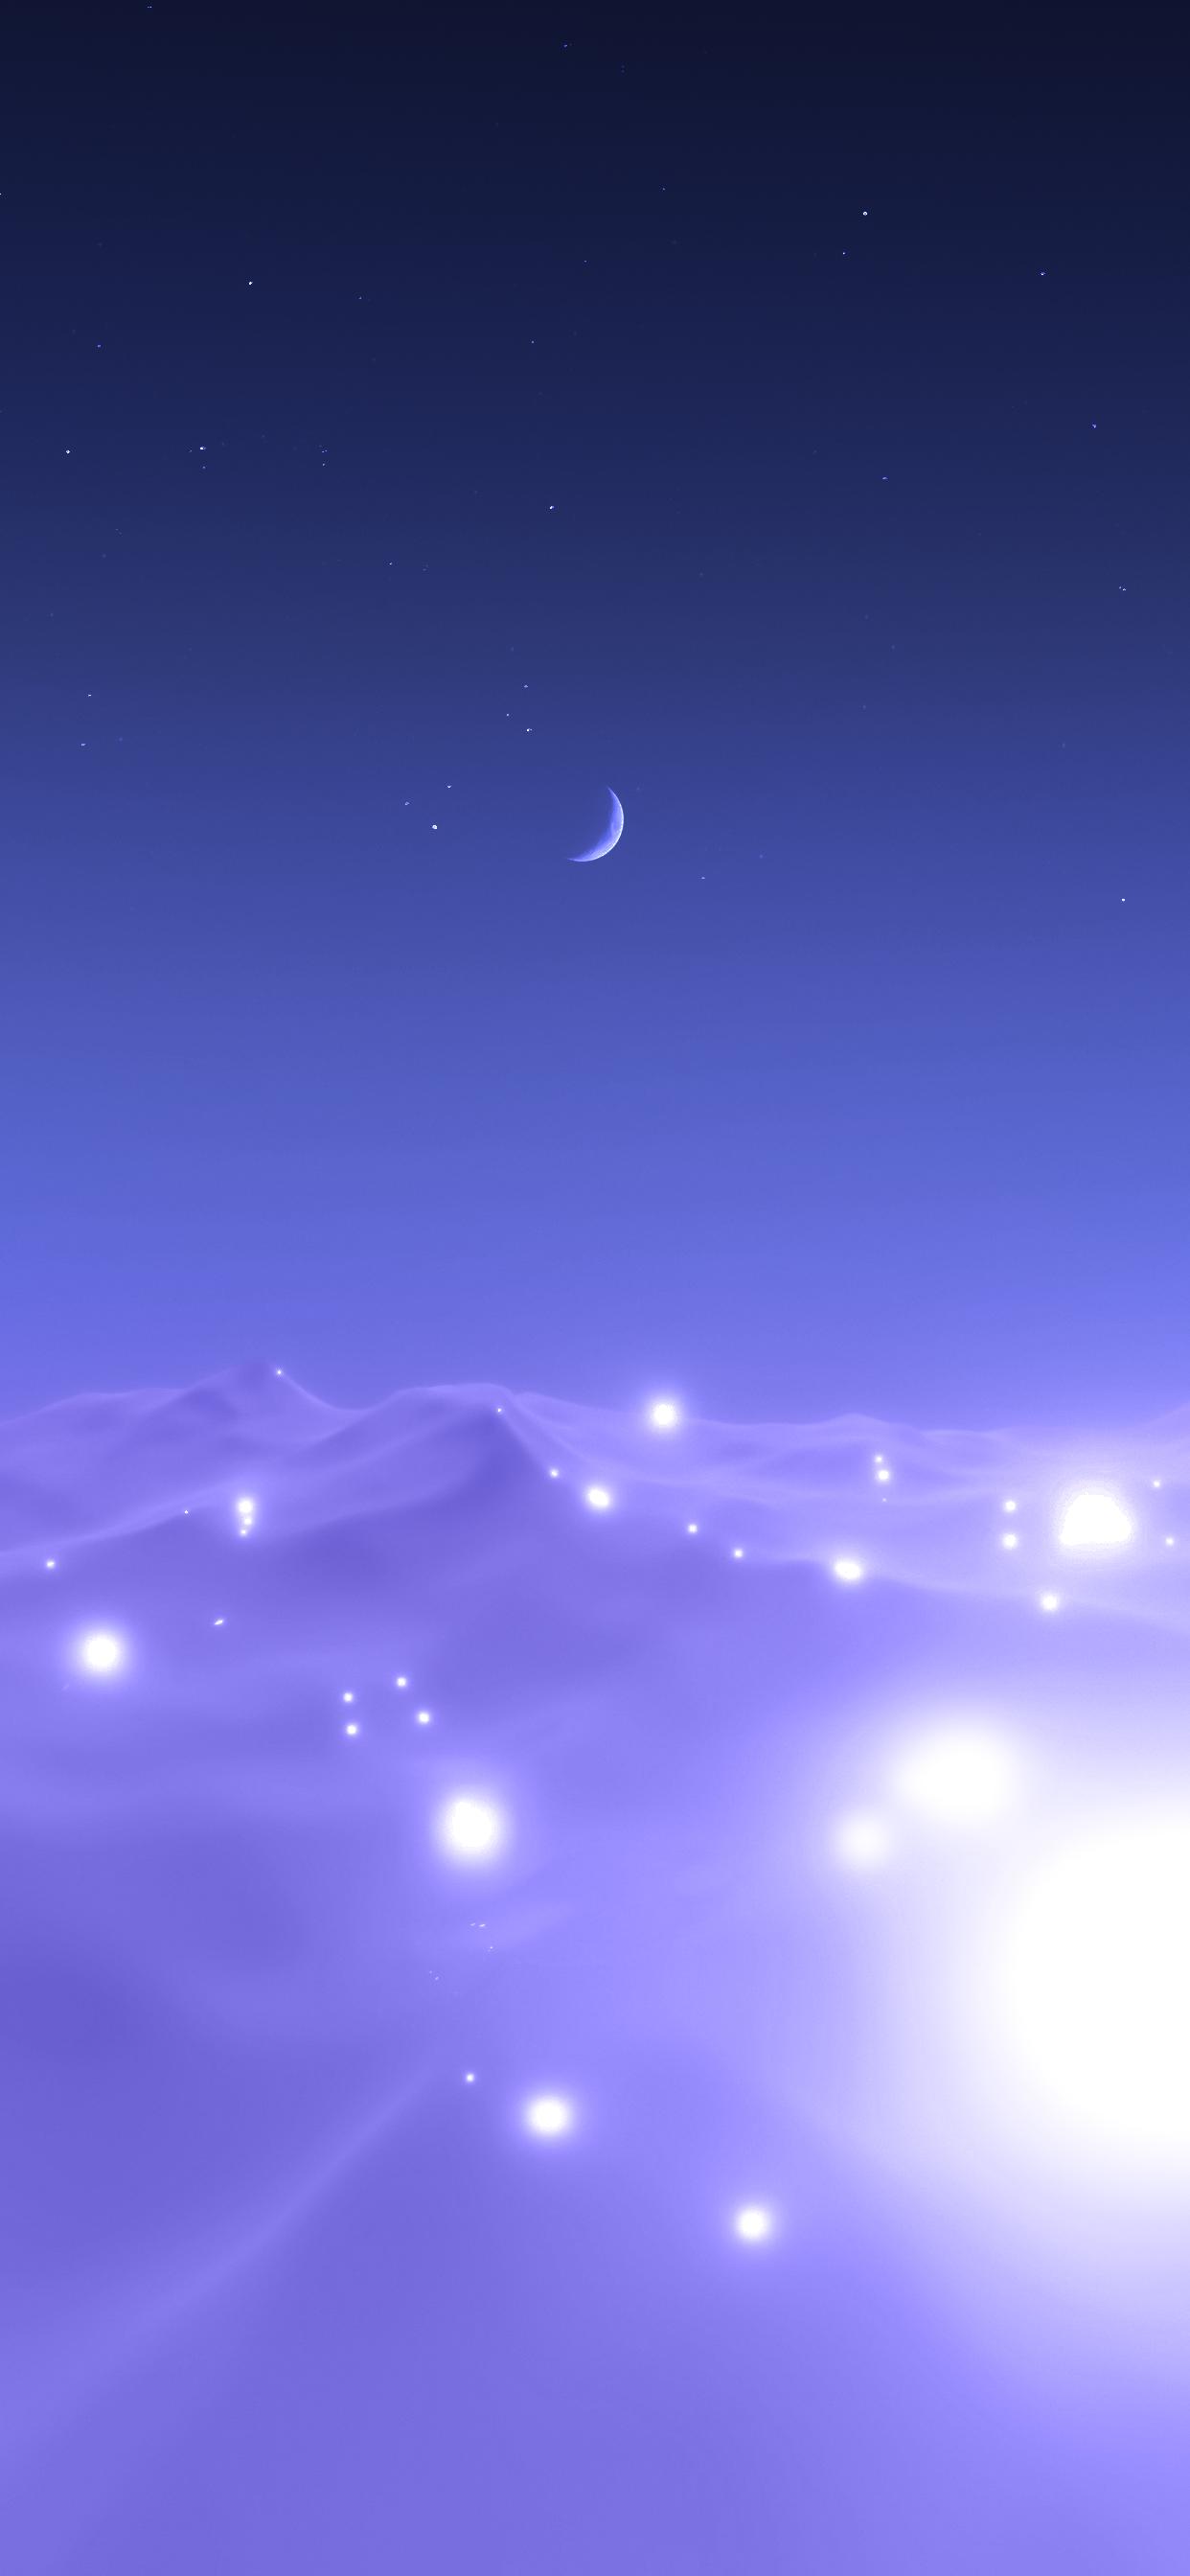 fantasy cloud iphone wallpapers Mirac iDownloadBlog above night